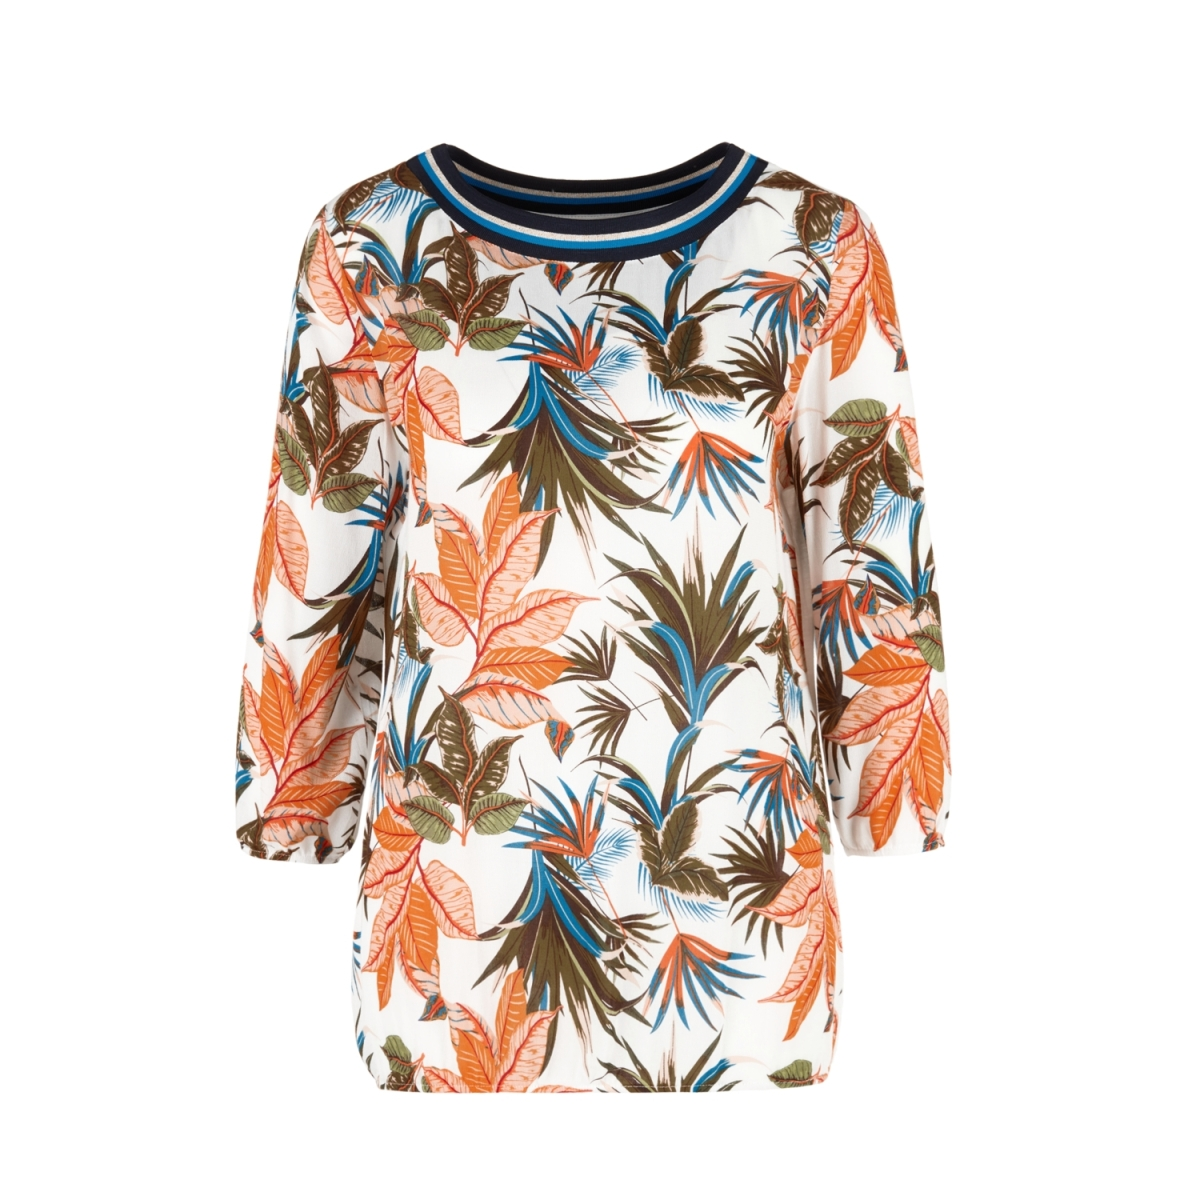 14903398366 s.oliver t-shirt 02b5